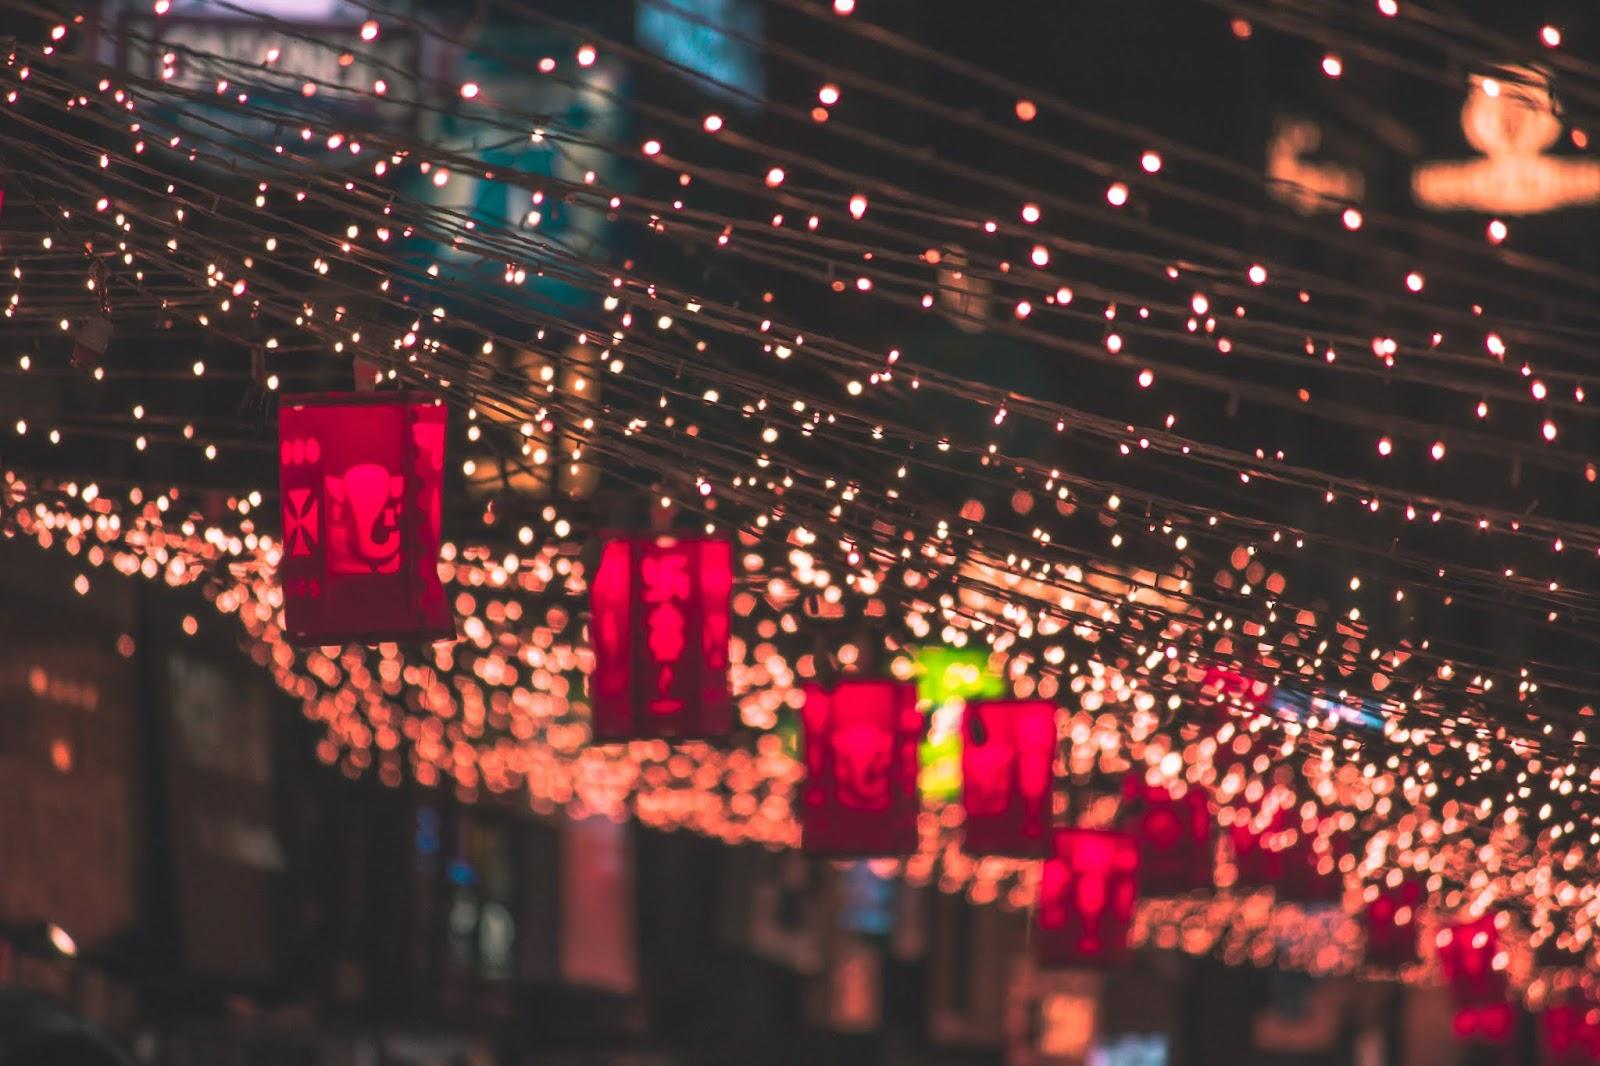 Happy Diwali 2018 Diwali Images Messages Quotes Happy Diwali